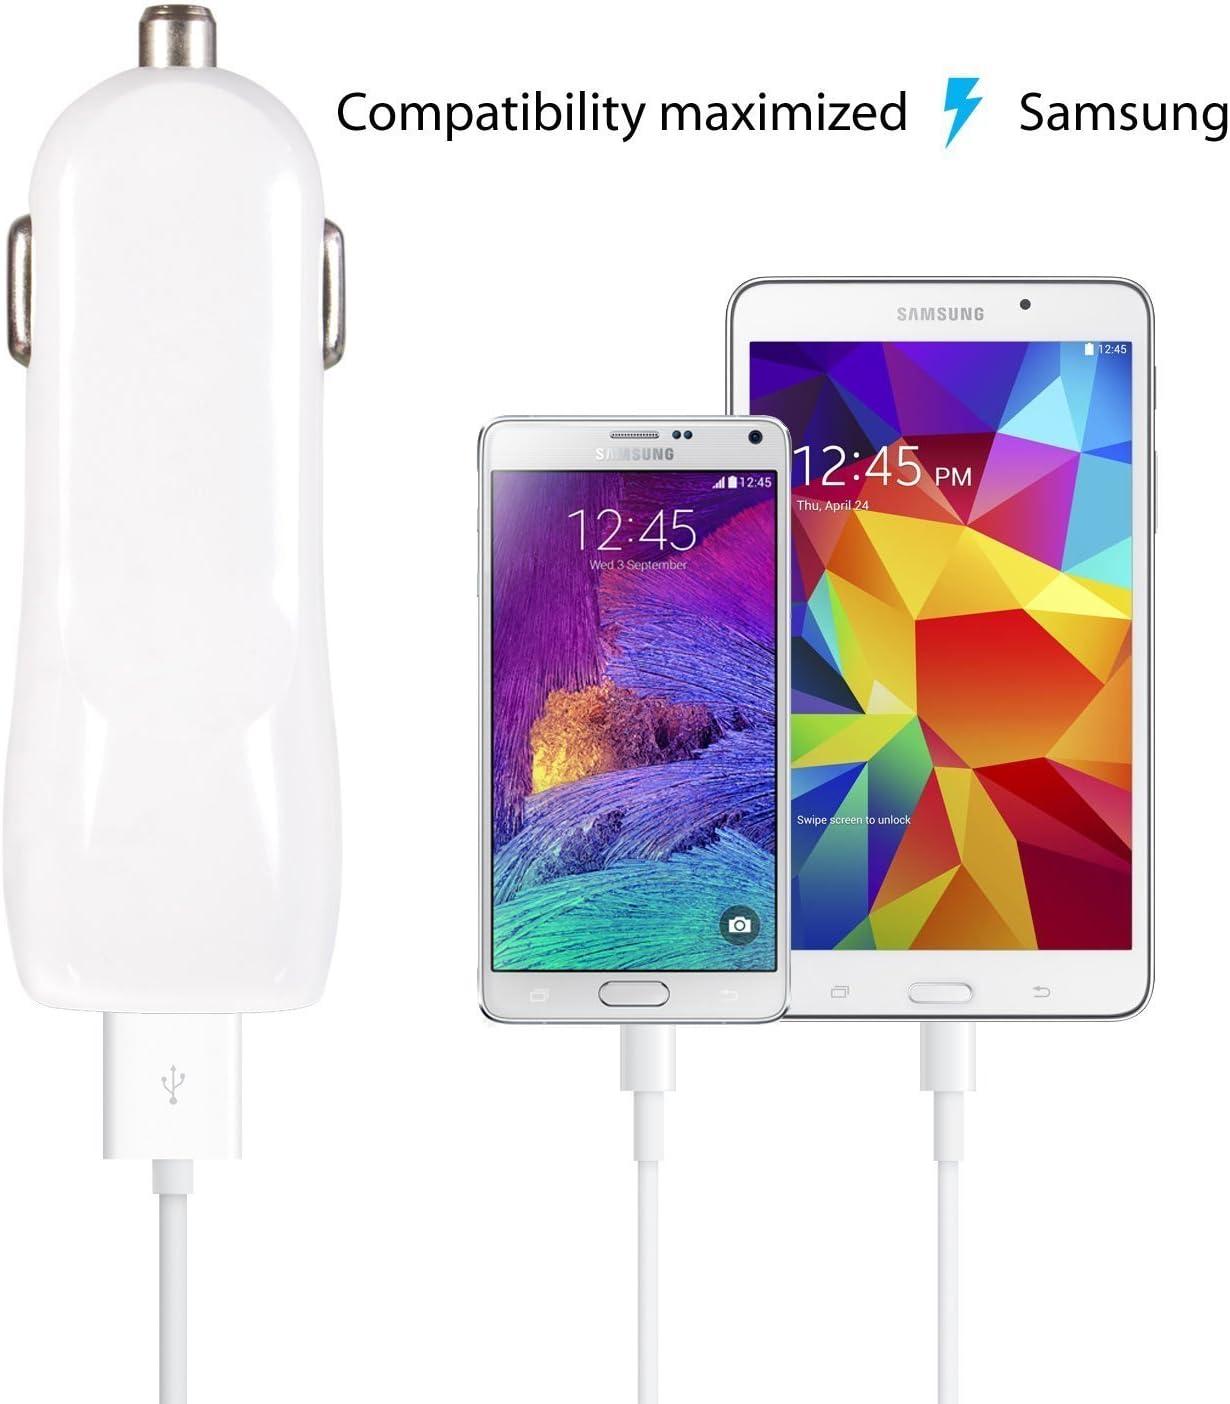 iRAG Charger for Samsung Galaxy S7/S7 Edge/S6/S6 Plus/J7 V/J7 Prime/J3 Prime/J3 Eclipse/S4/S3/Note 4/5/ Note Edge/J3 Emerge/J7 Perx/Amp Prime 3.1 AMP ...